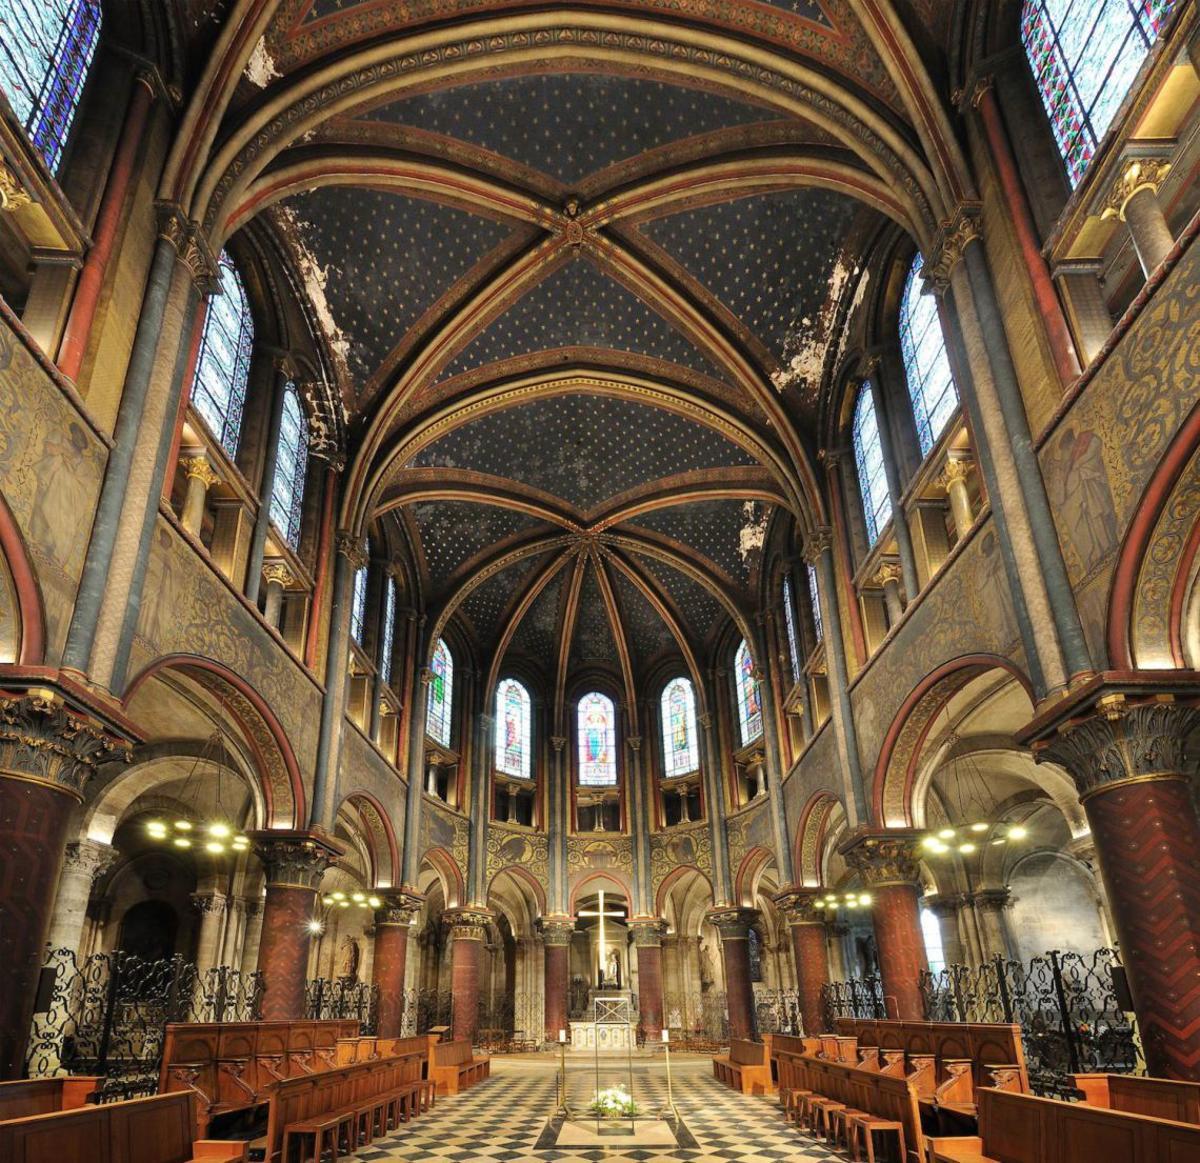 Церковь сен жермен де пре в париже